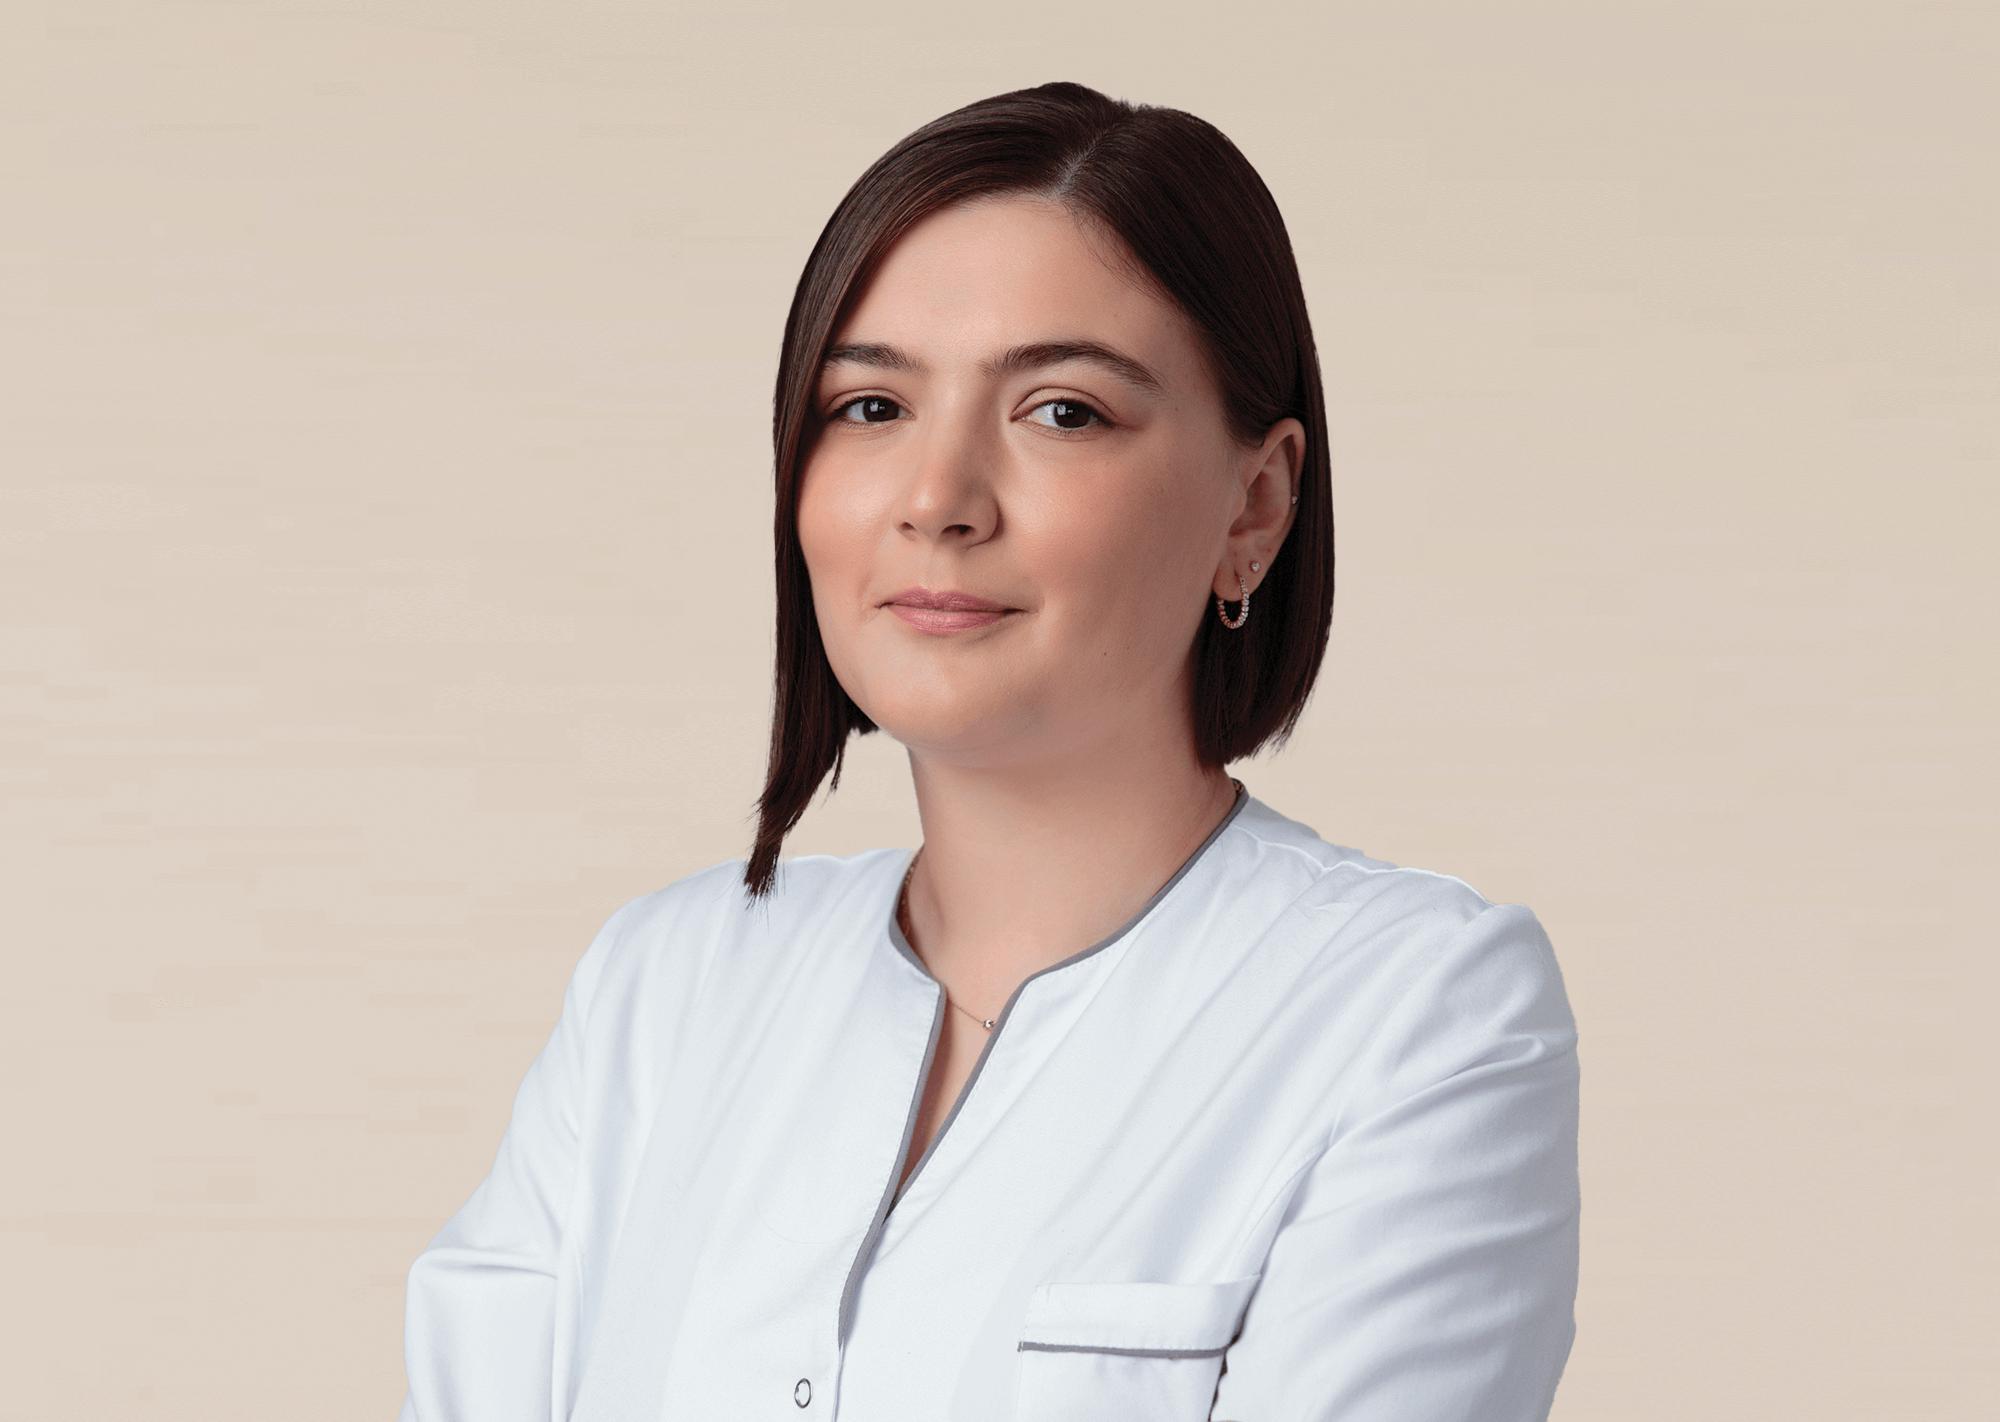 Тинатин Гиуашвили